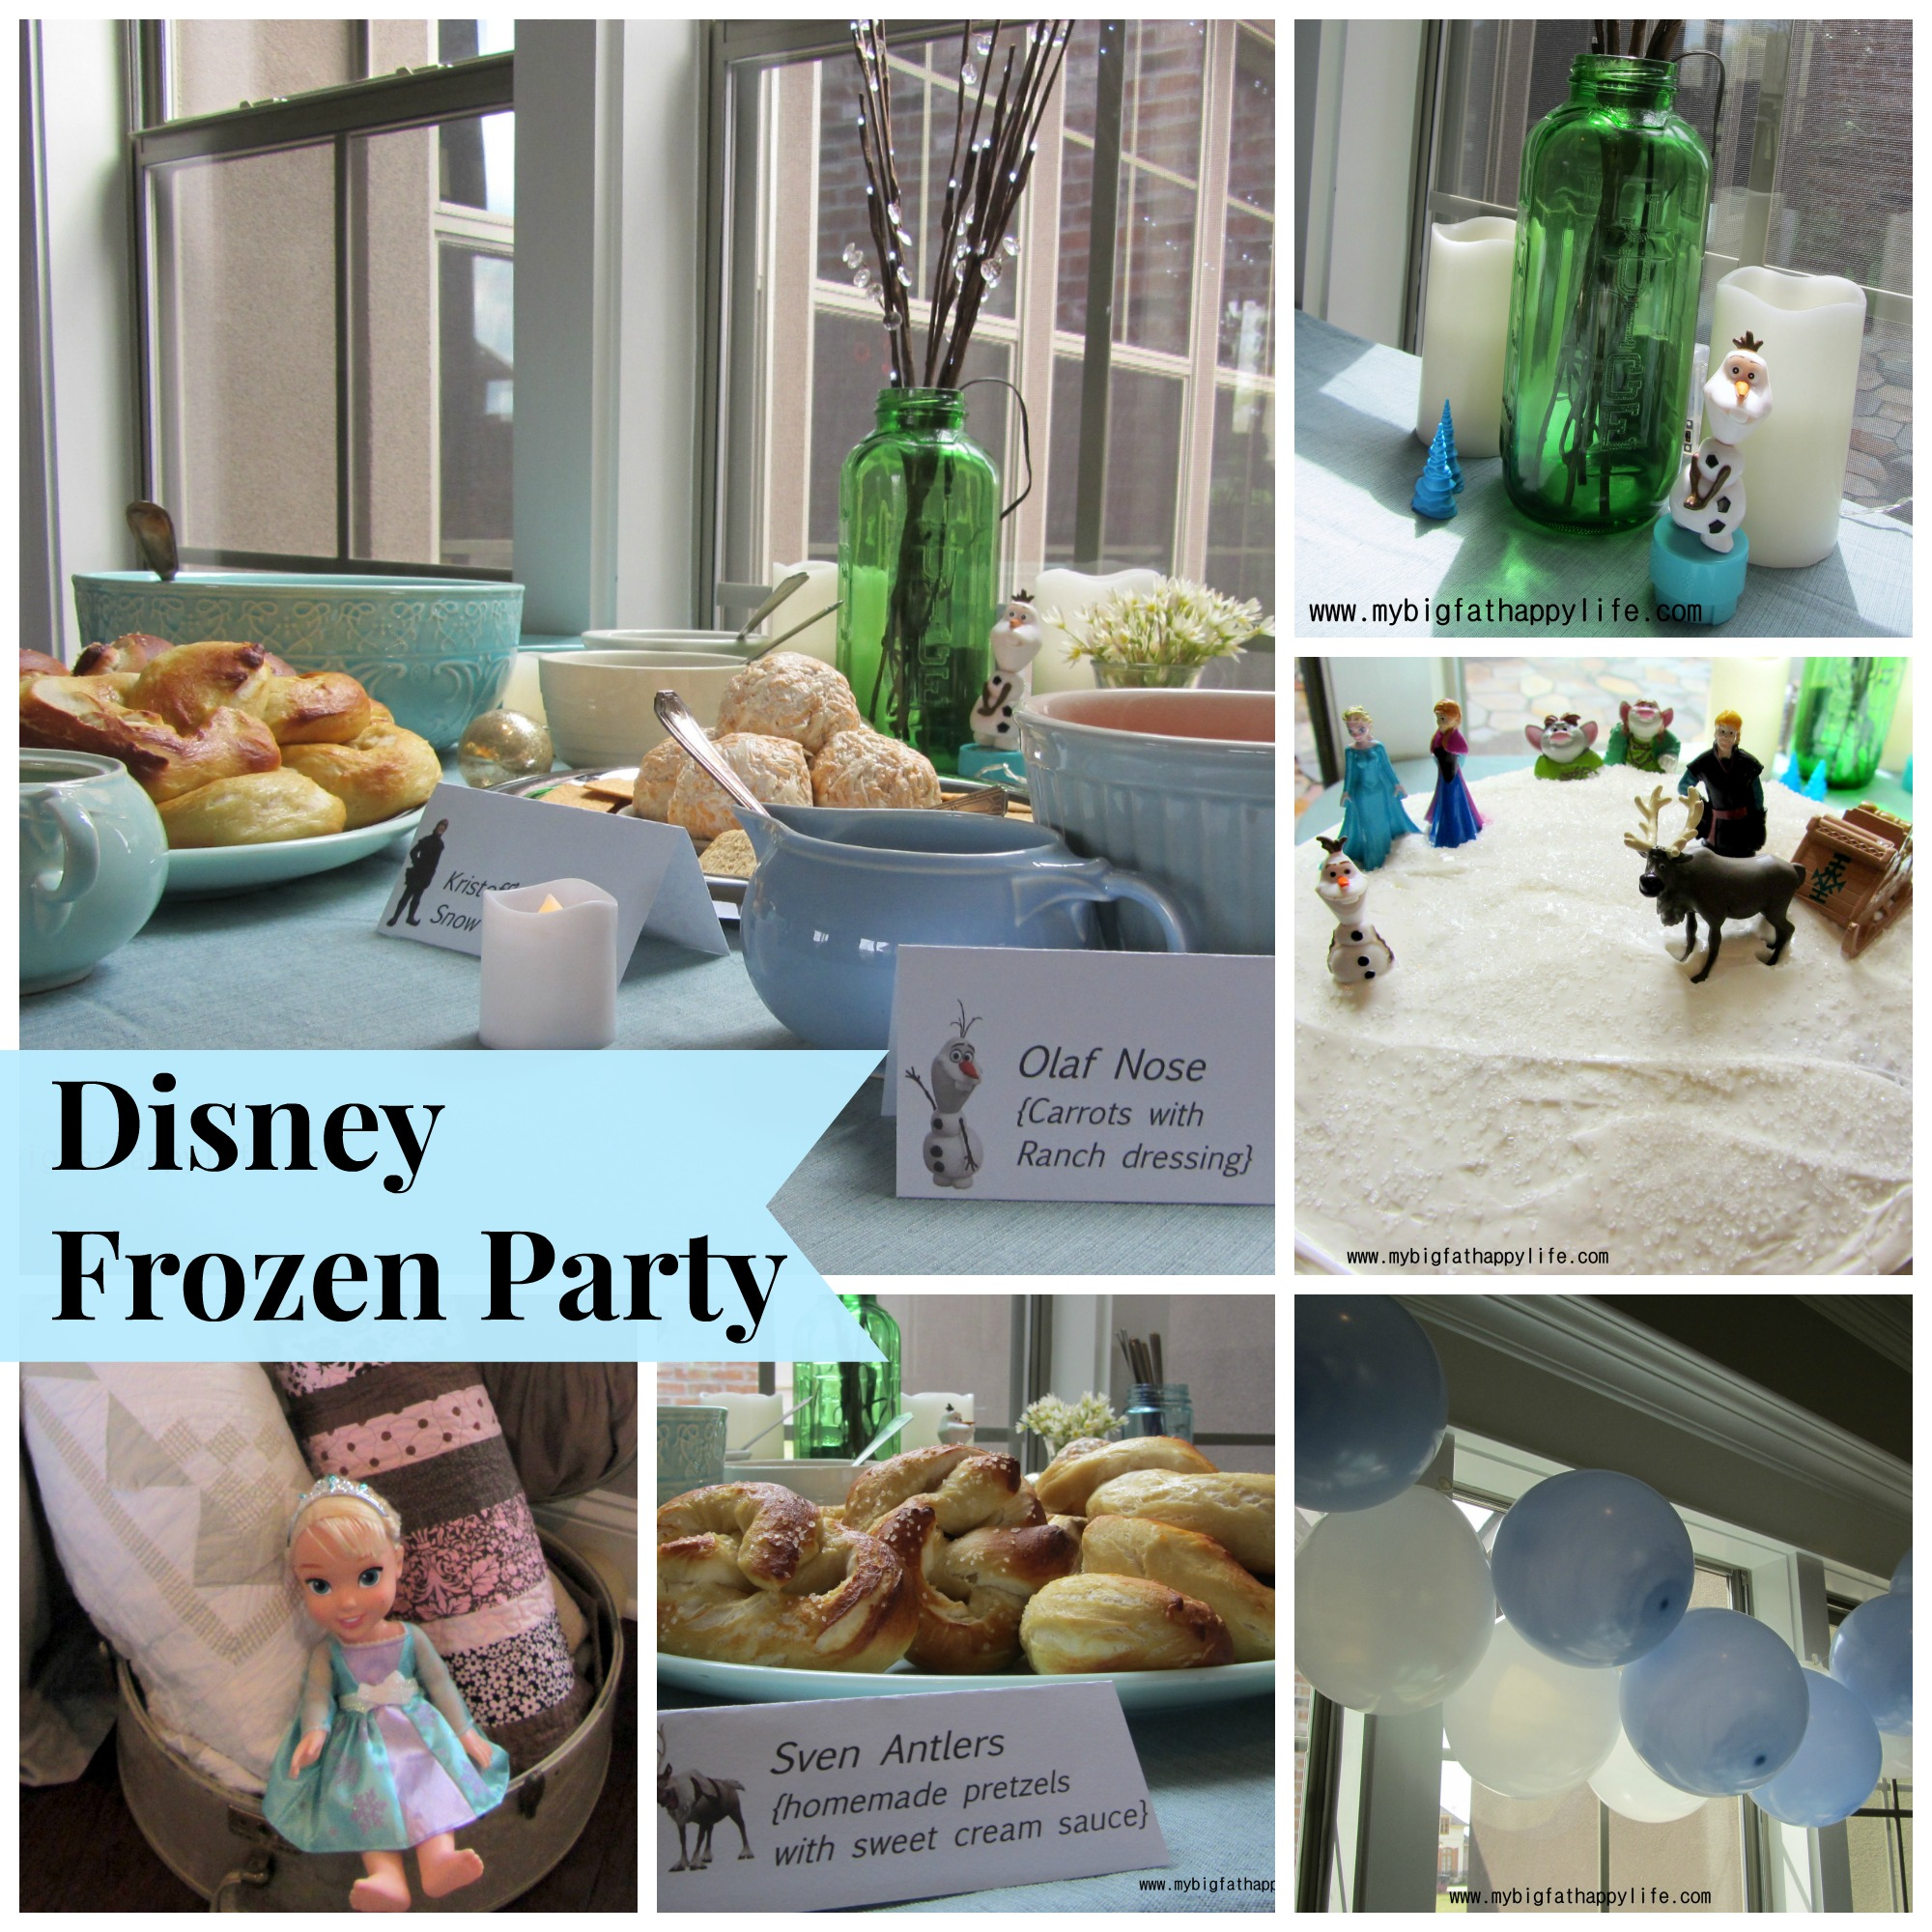 Disney Frozen Party   mybigfathappylife.com